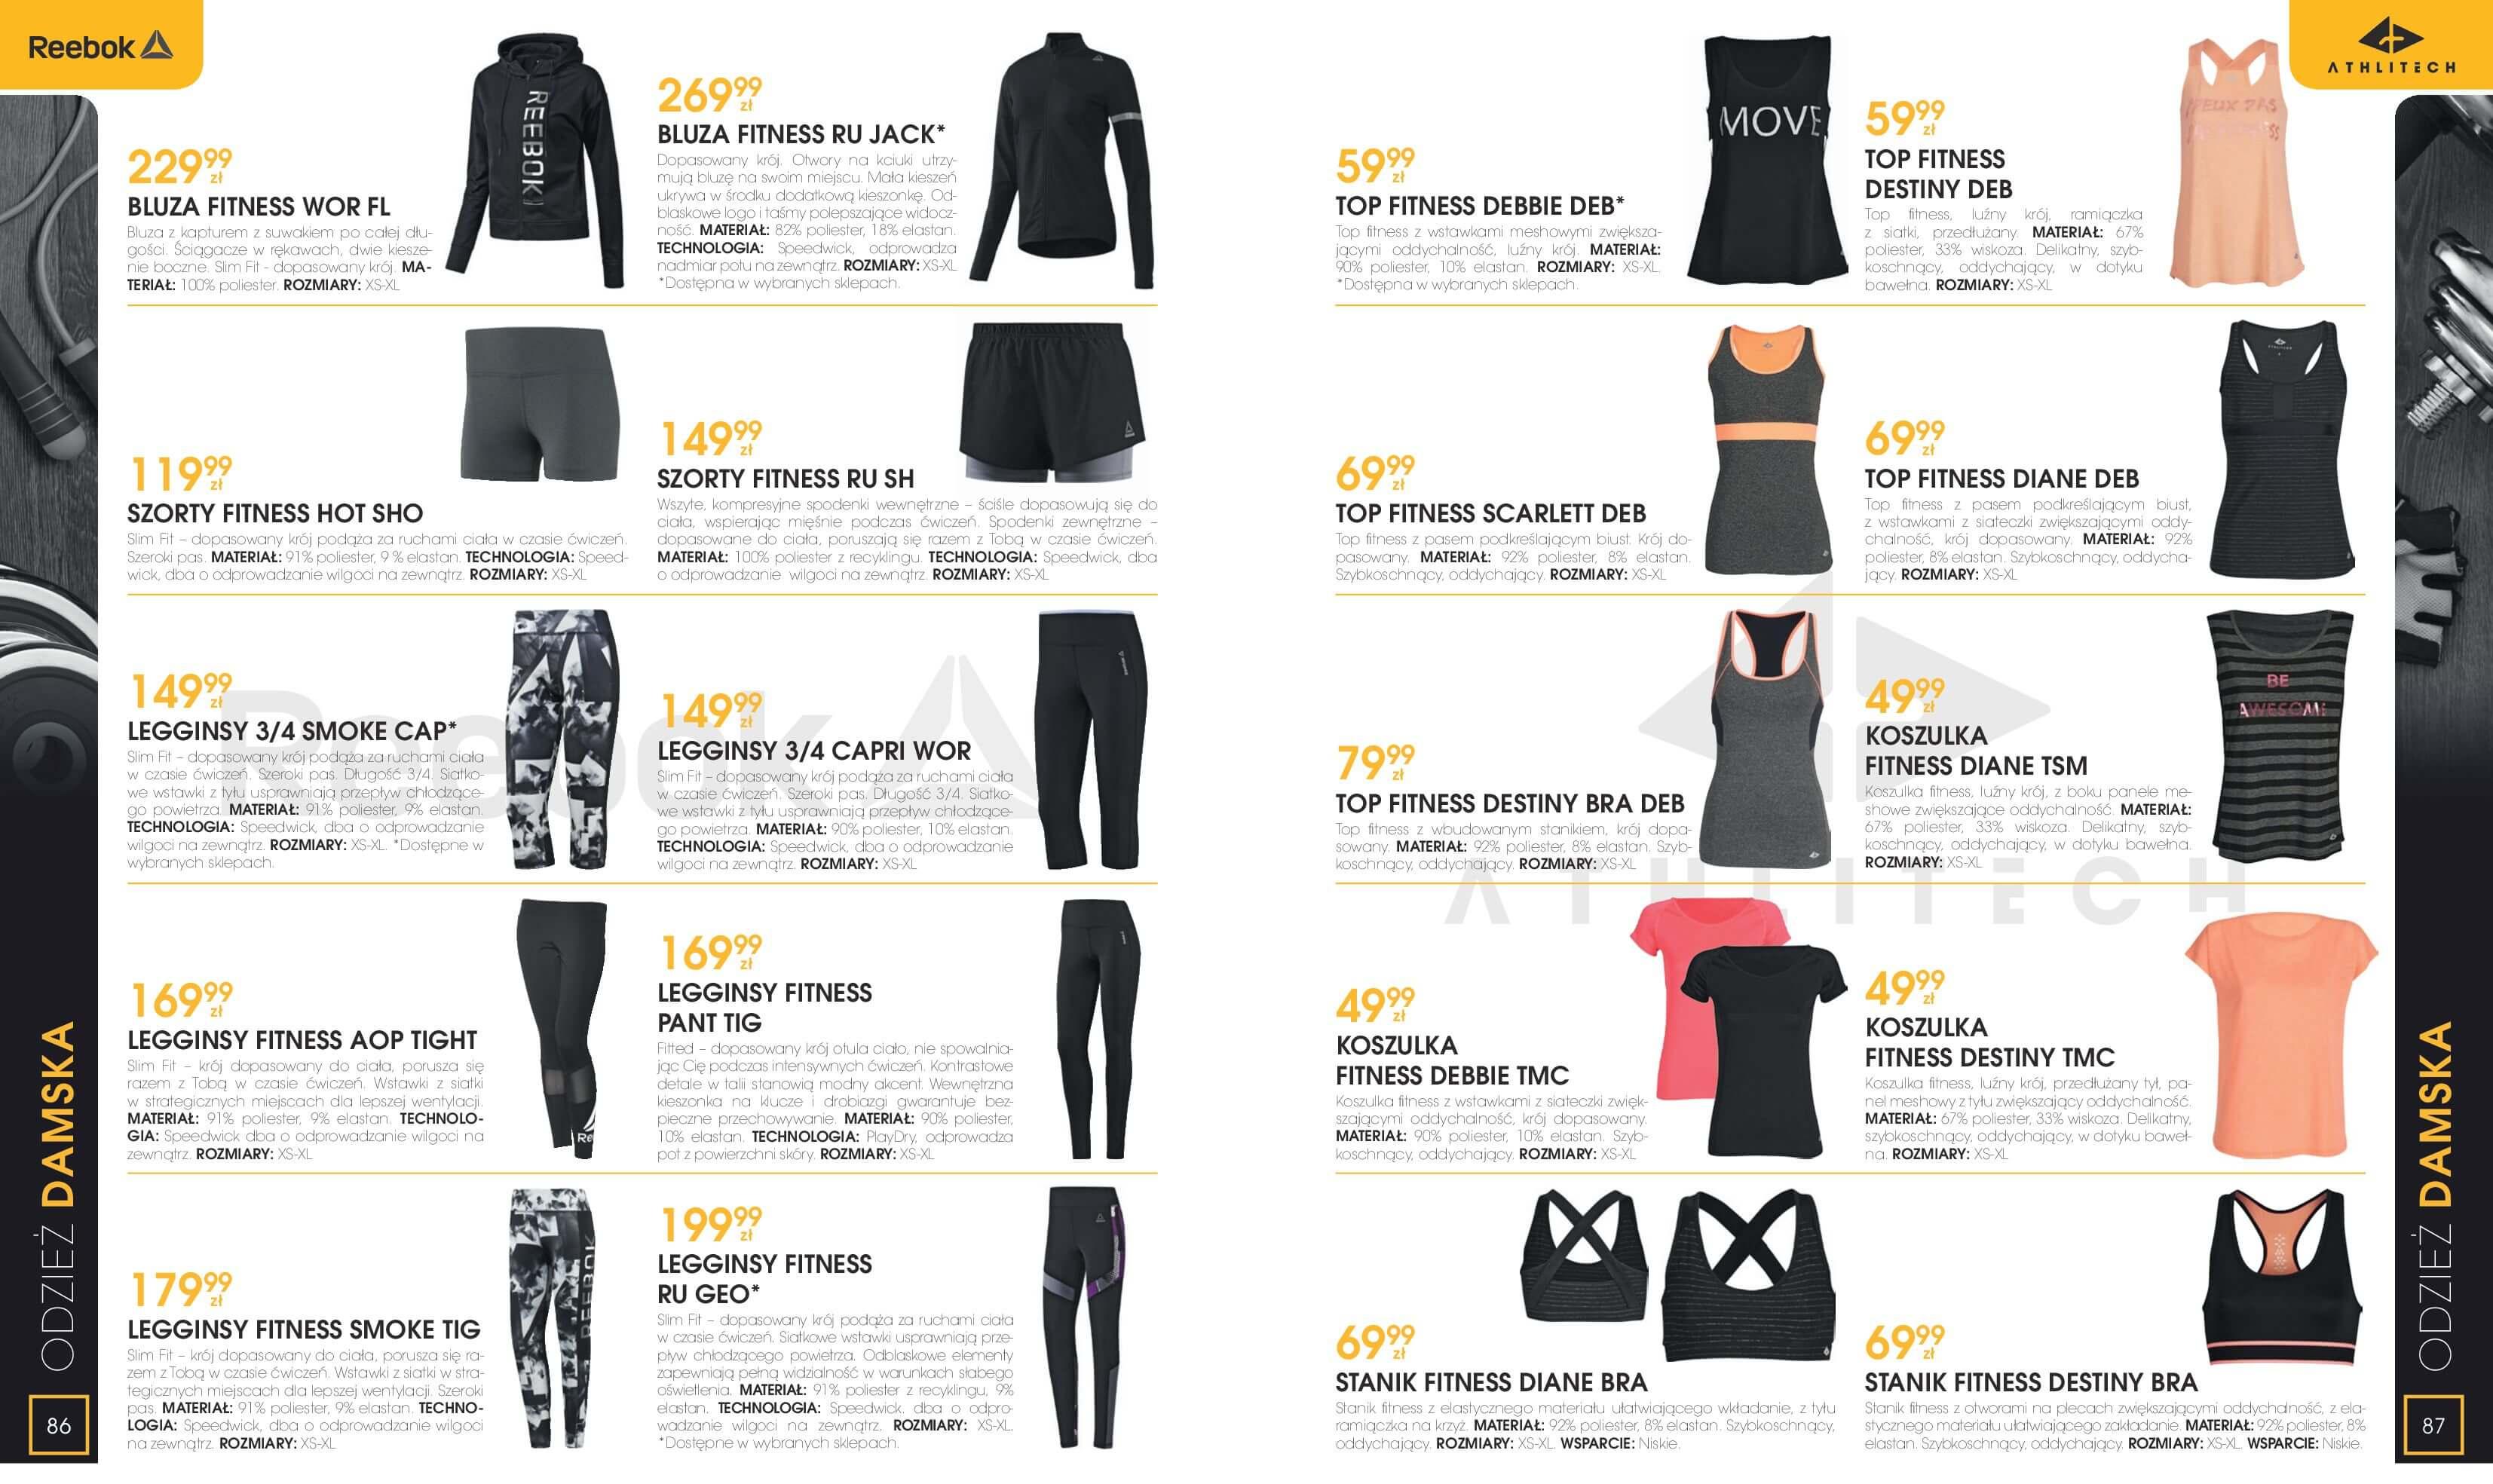 Gazetka Go Sport - Katalog fitness 2017/2018-15.10.2017-31.12.2018-page-